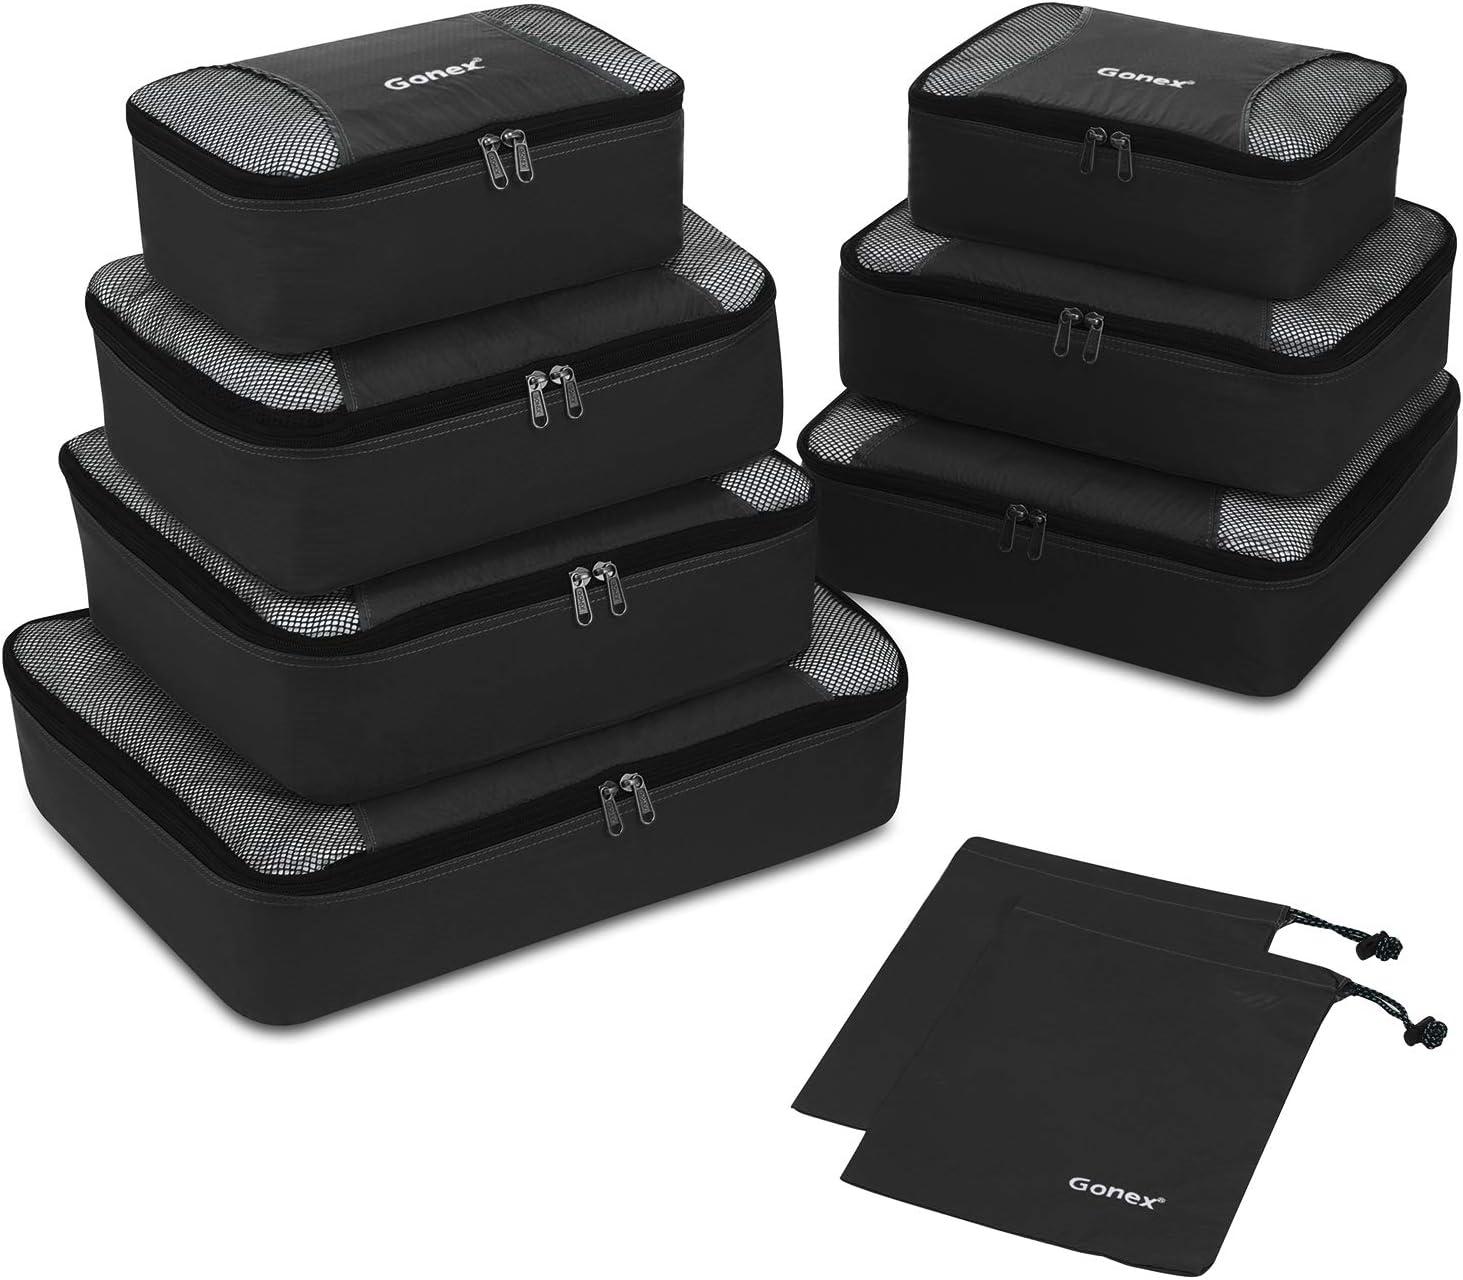 Gonex – 9 Packs Organizador para Maletas/Viaje Bolsas de Embalaje/Almacenaje Ultraligeros Multifuncionales Rip-Stop de Nylon Negro